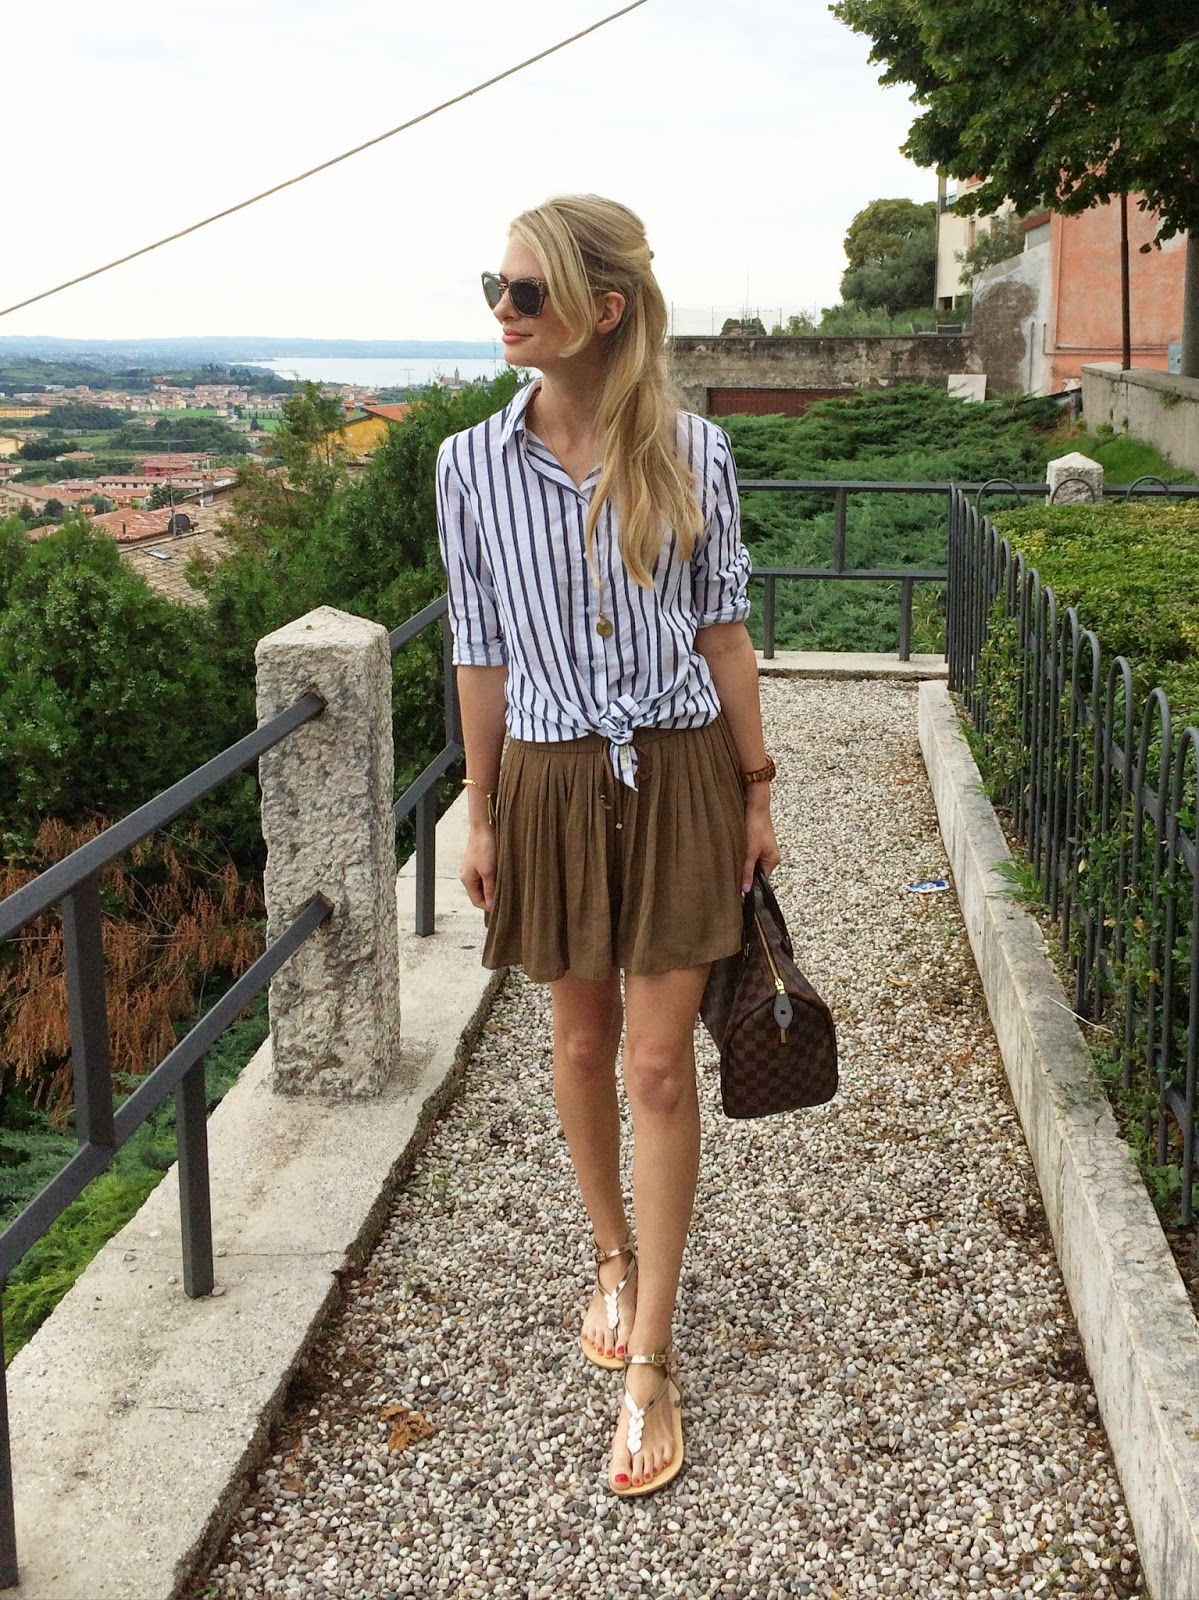 h&m shirt, H&M striped shirts, monica vinader, monica vinader necklace, street style, fashion blogger, skirt and shirt, toe sandals, golden sandals, pleated skirt, pleated shorts, zara pleated skirt